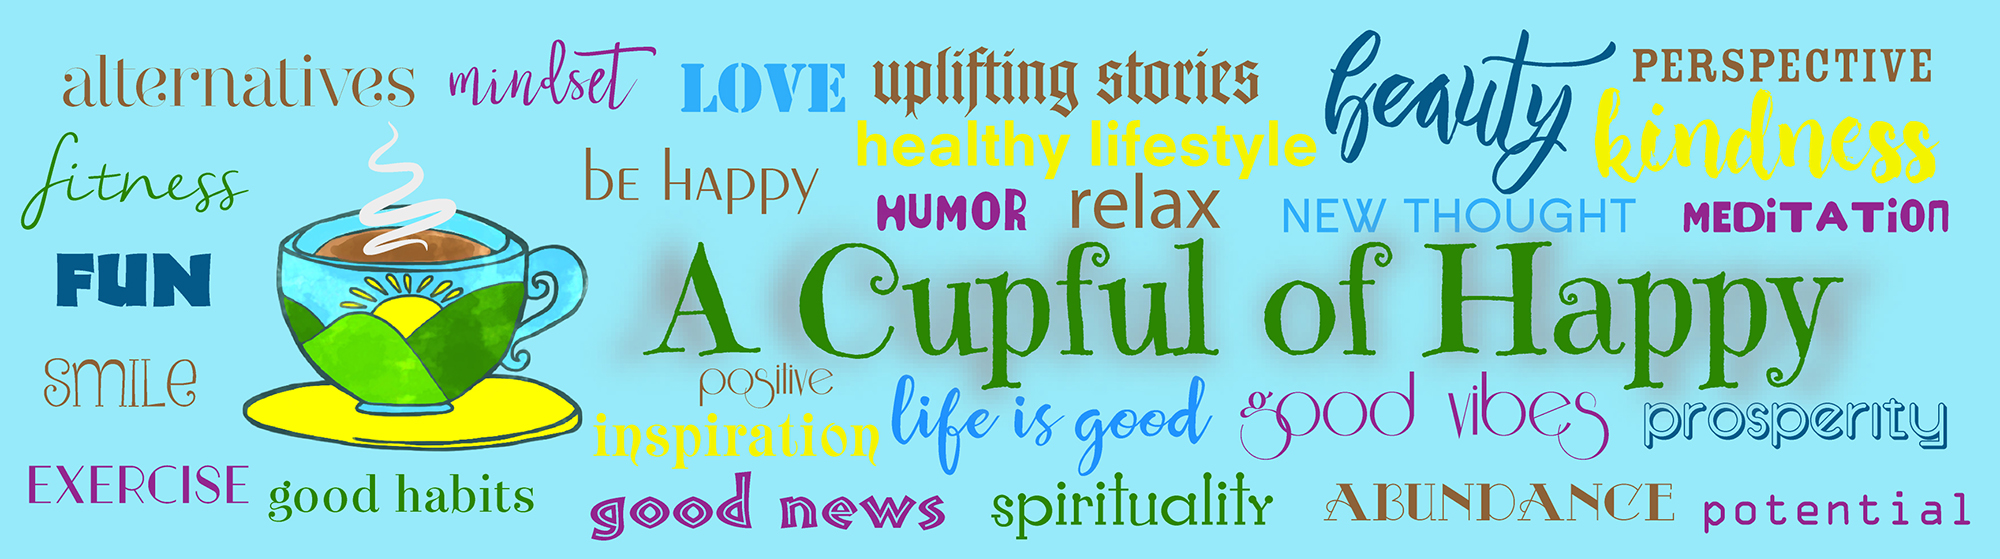 A Cupful Of Happy